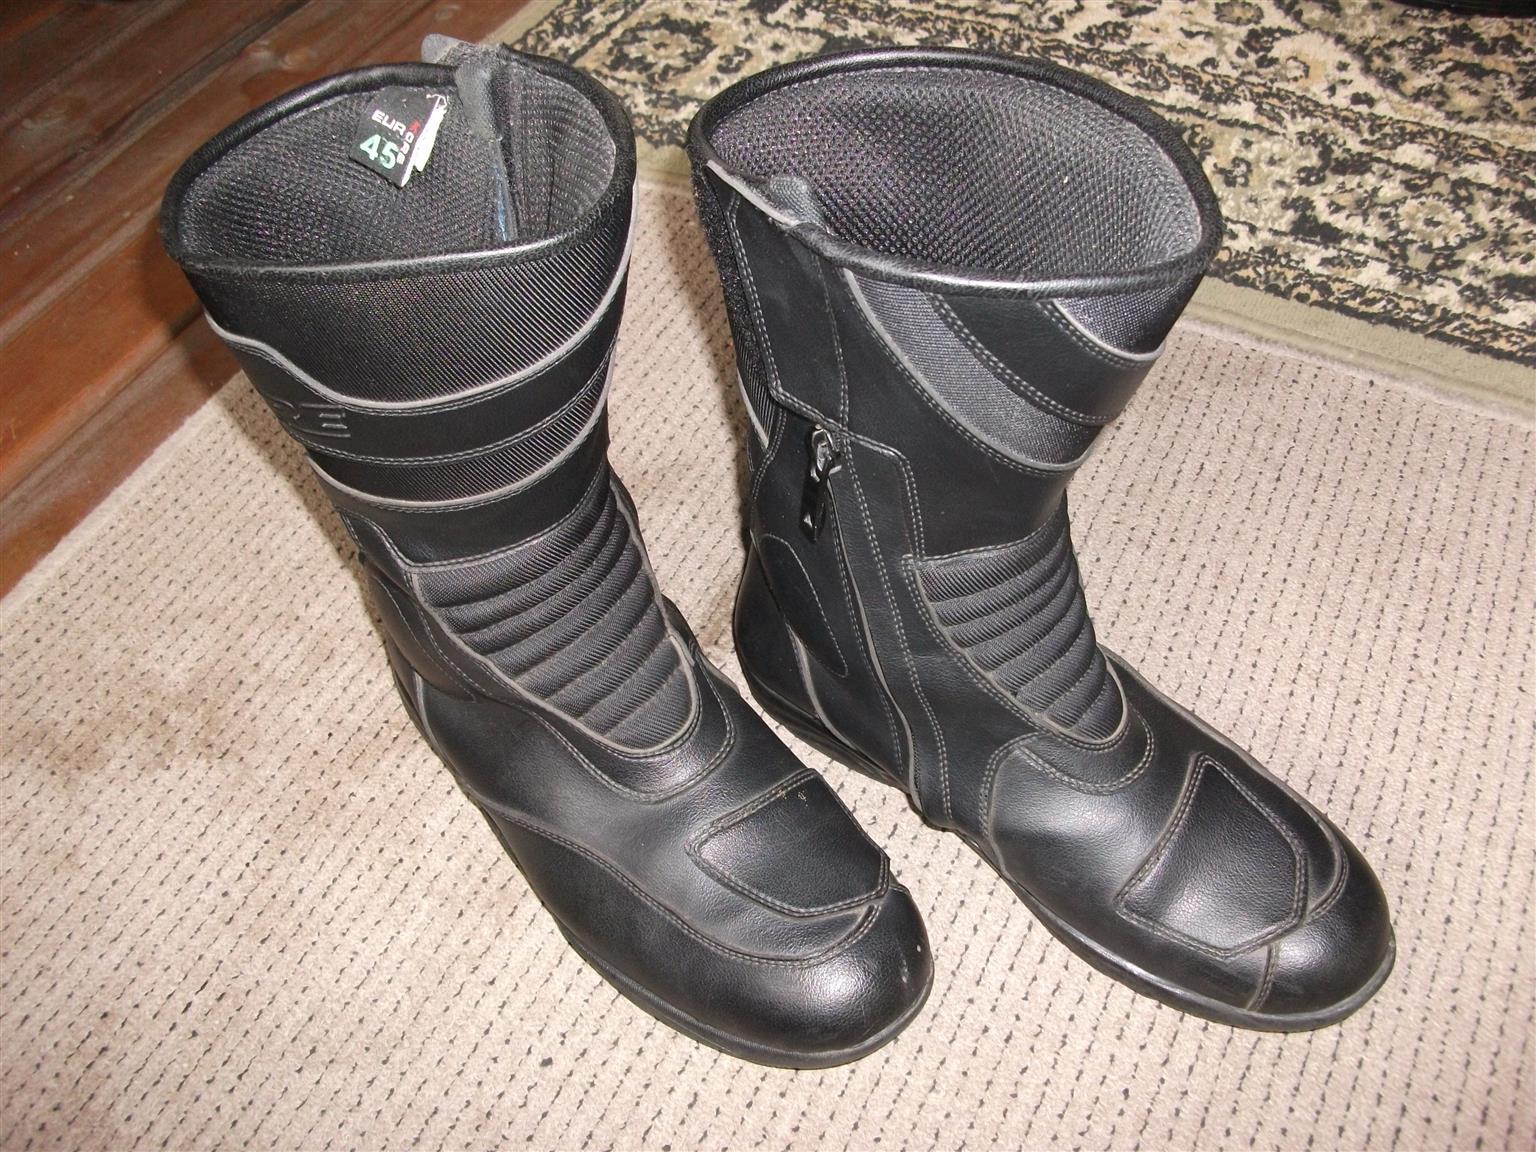 Biker Boots for sale